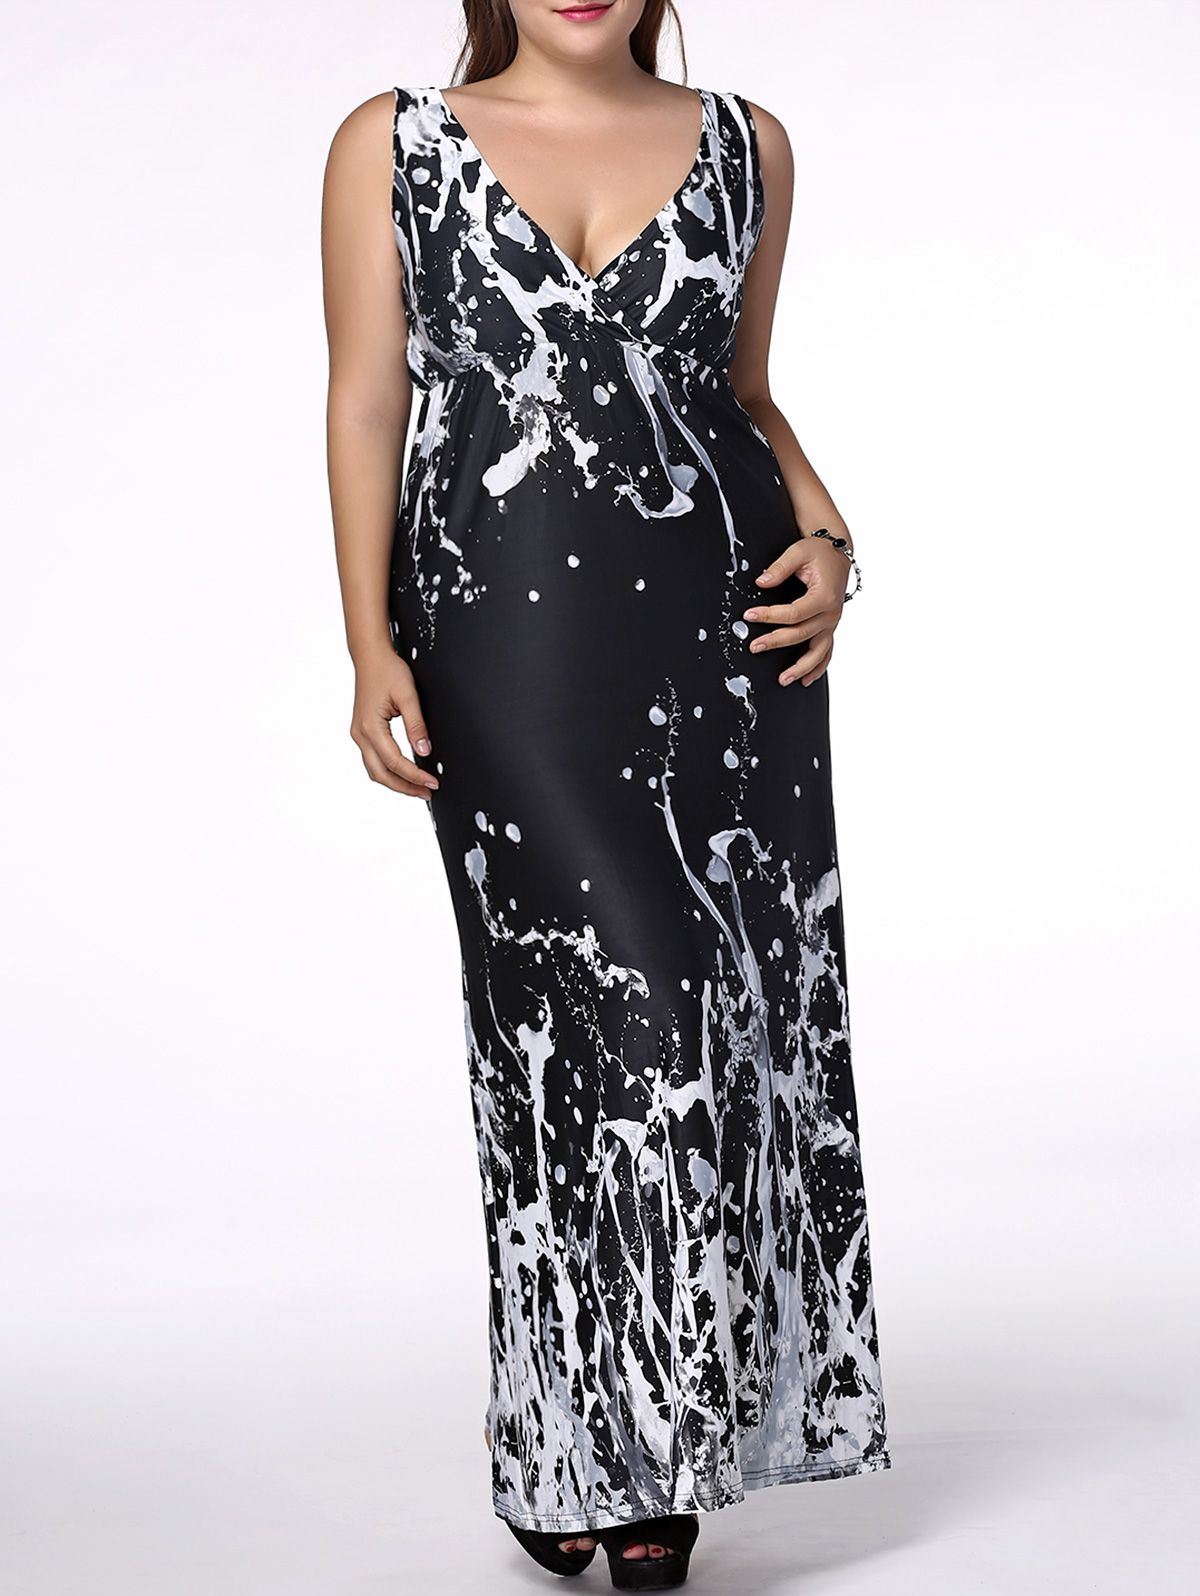 Women's Plus Size Alluring Plunging Neck Scrawl Print Dress